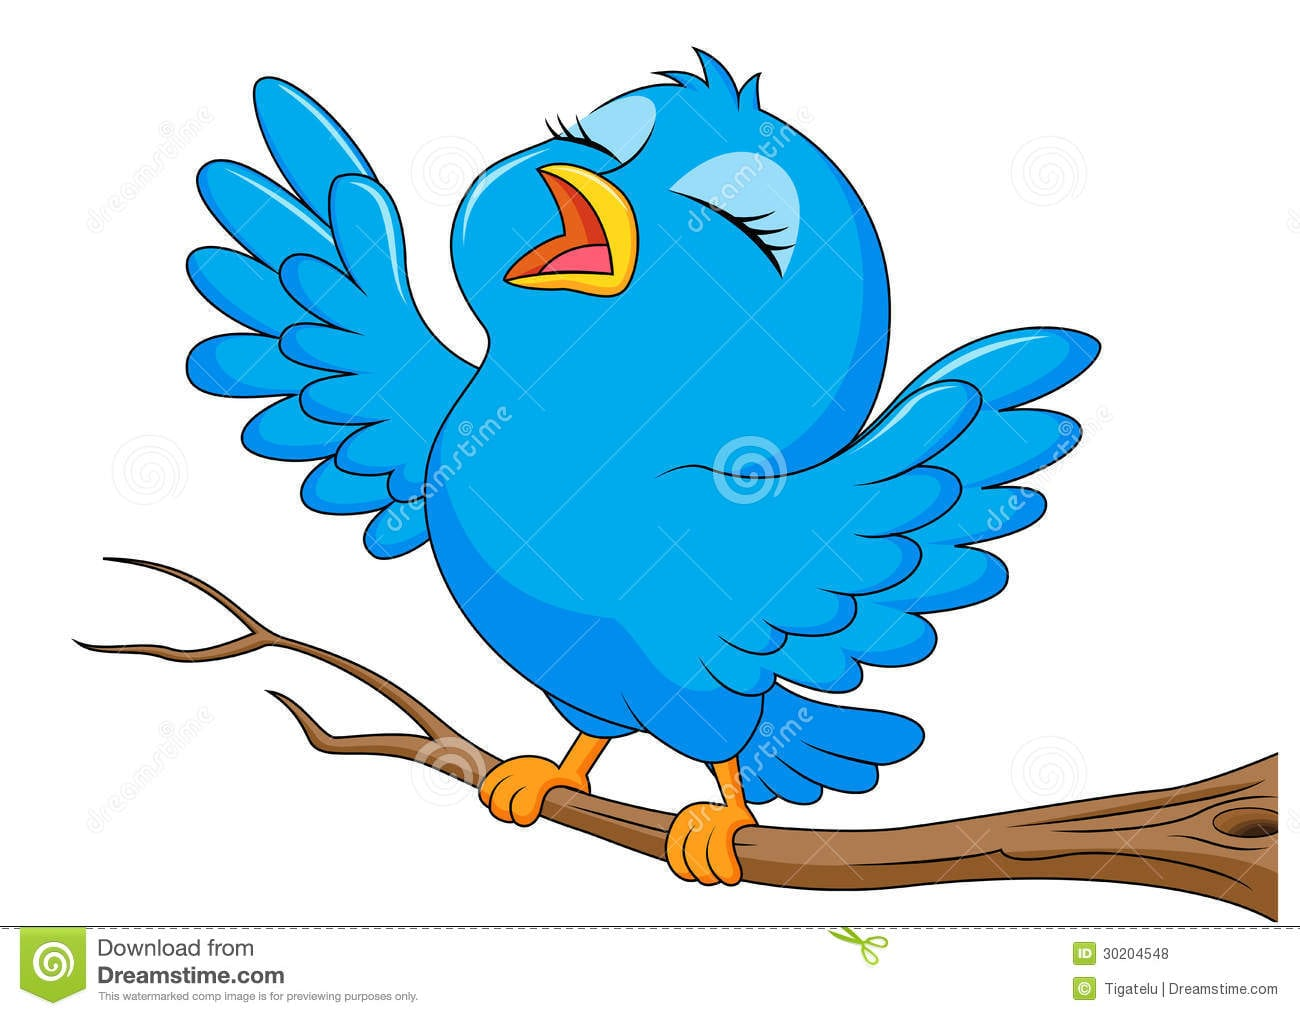 canto_azul_dos_desenhos_animados_do_p%C3%83%C2%A1ssaro_fotos_de_stock_royalty_3.jpg